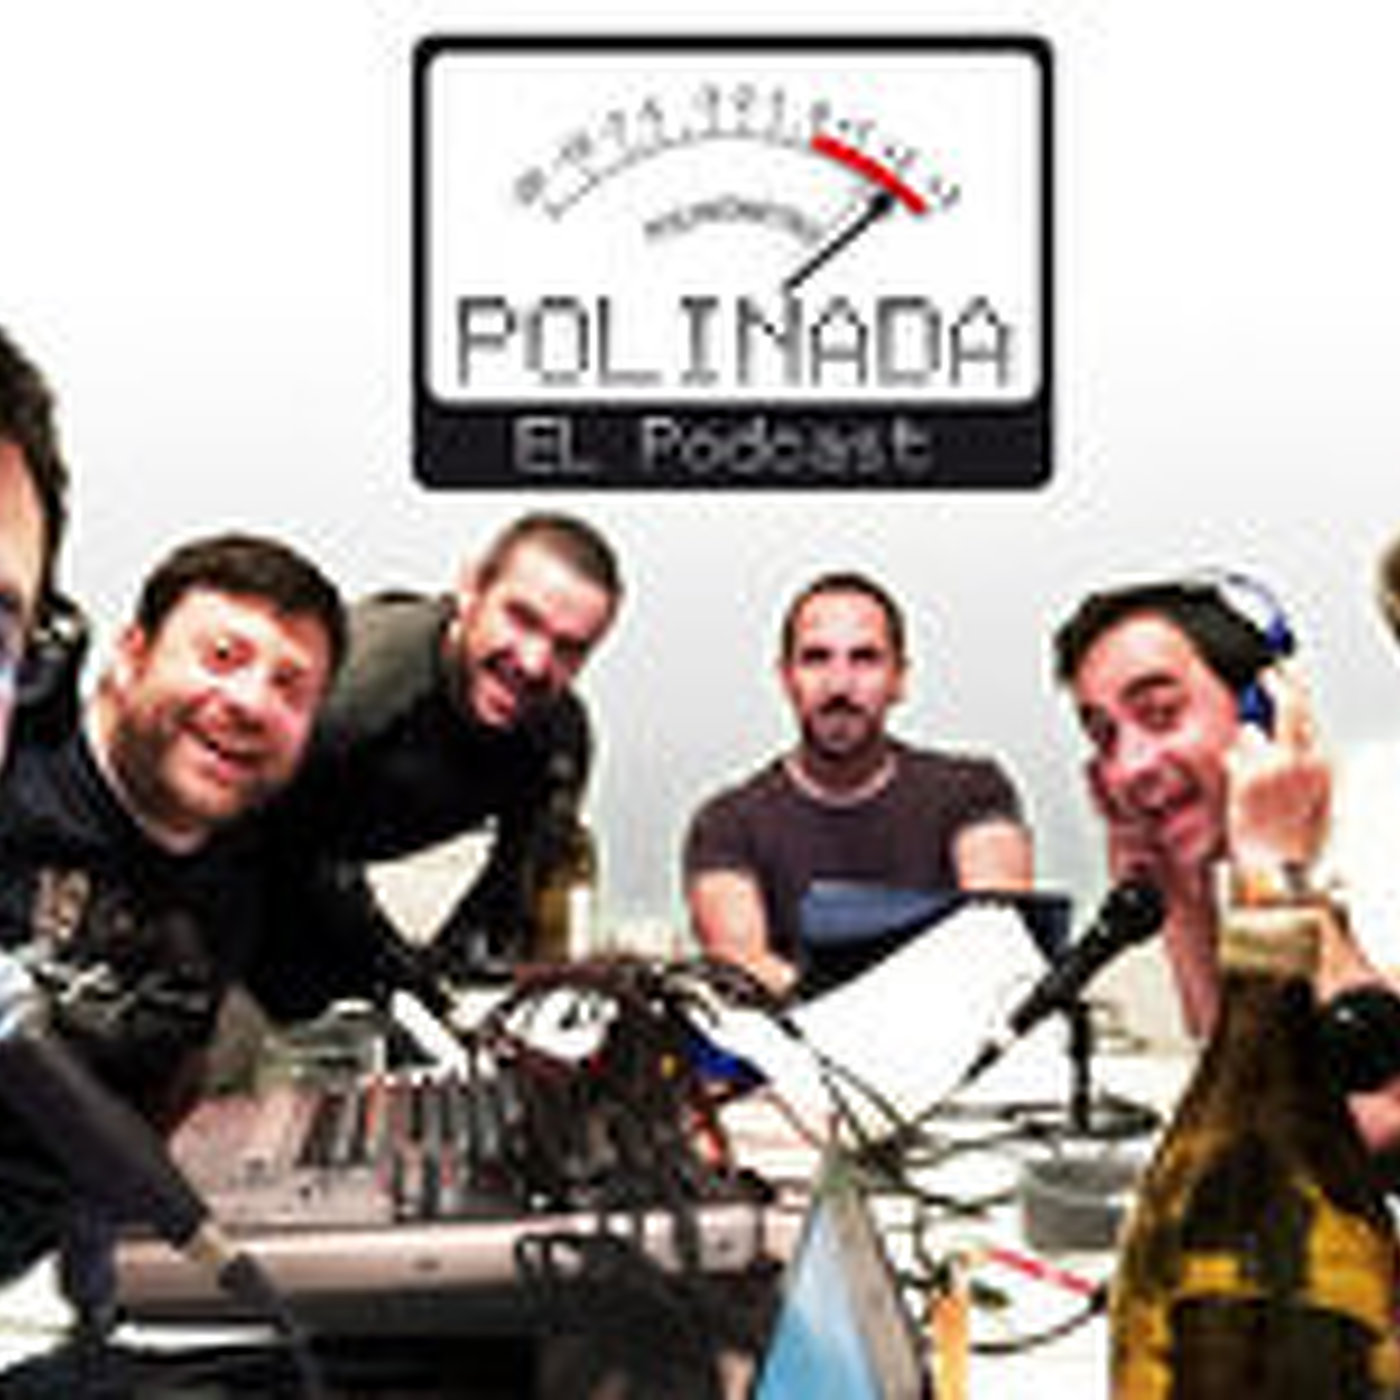 Polinada el podcast 1x04 – El Origen es así